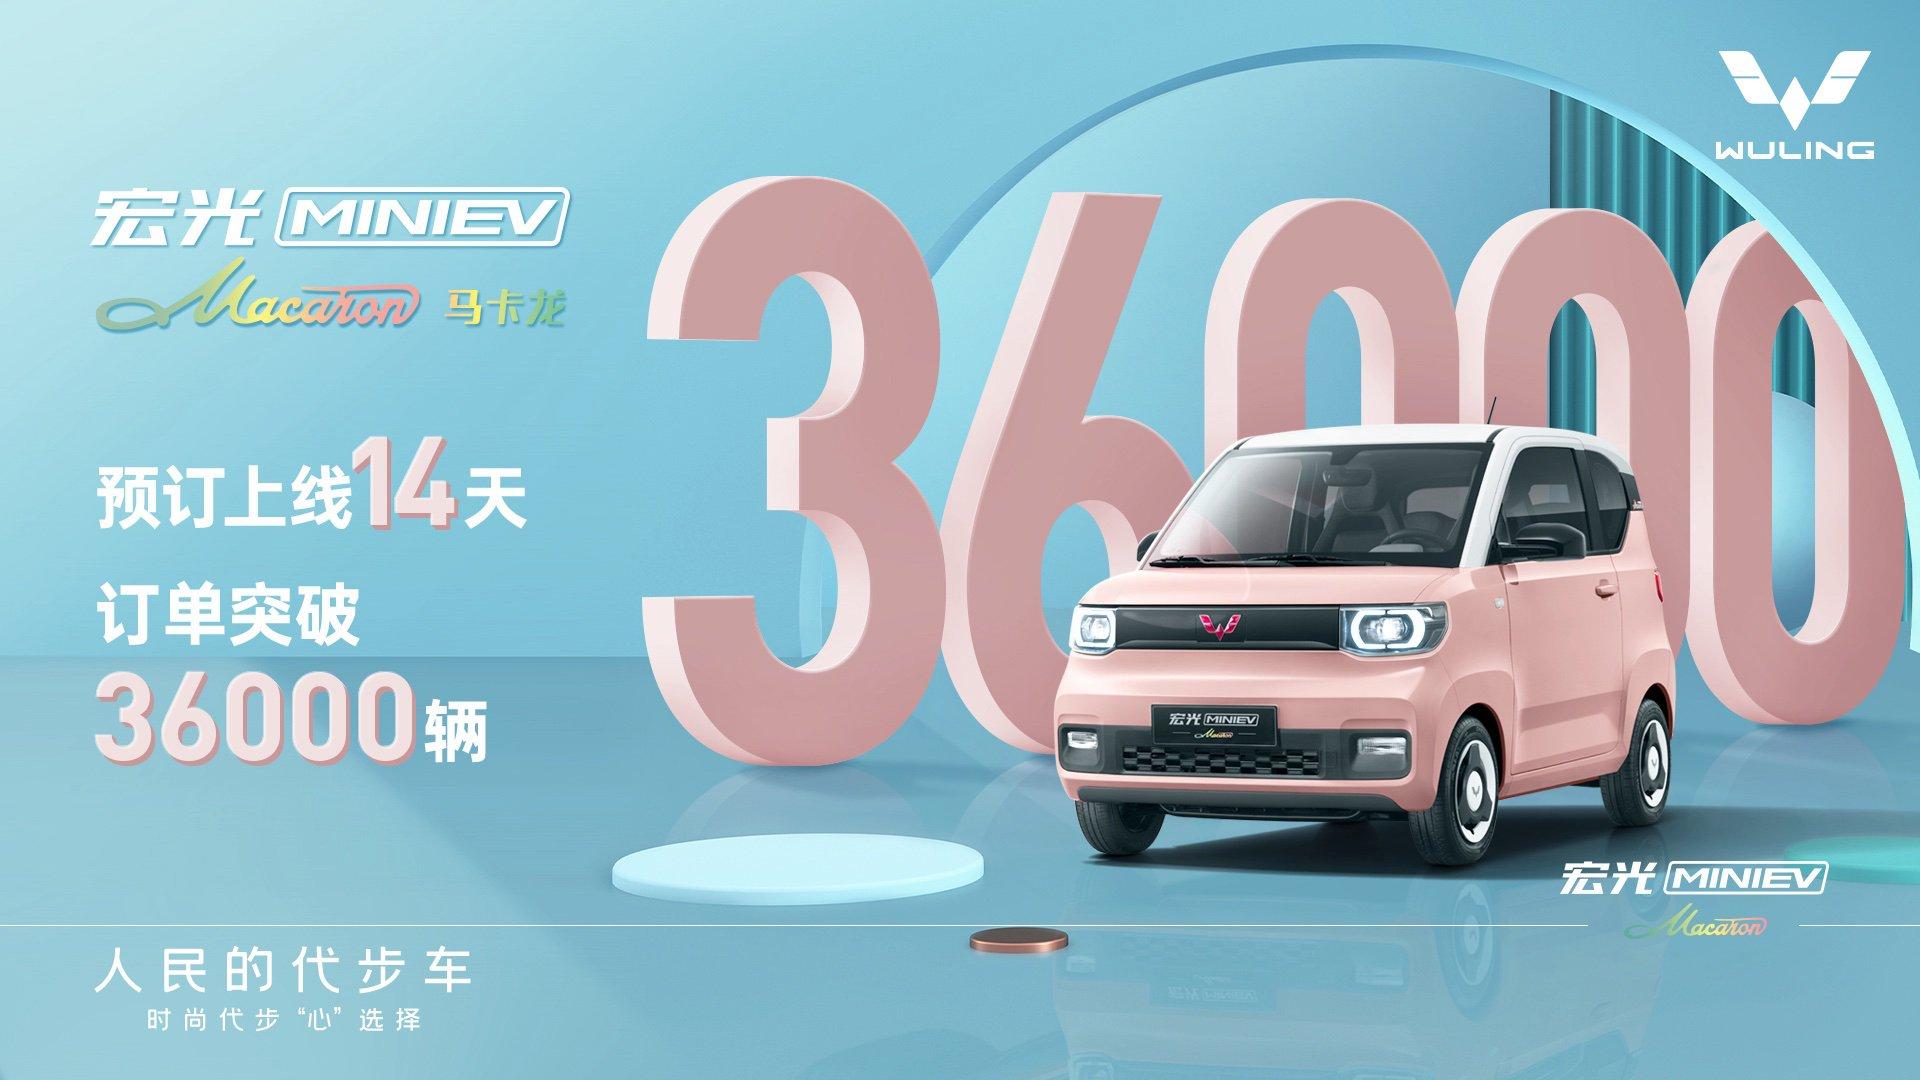 Wuling_HongGuang_Mini_EV_Macaron-0005